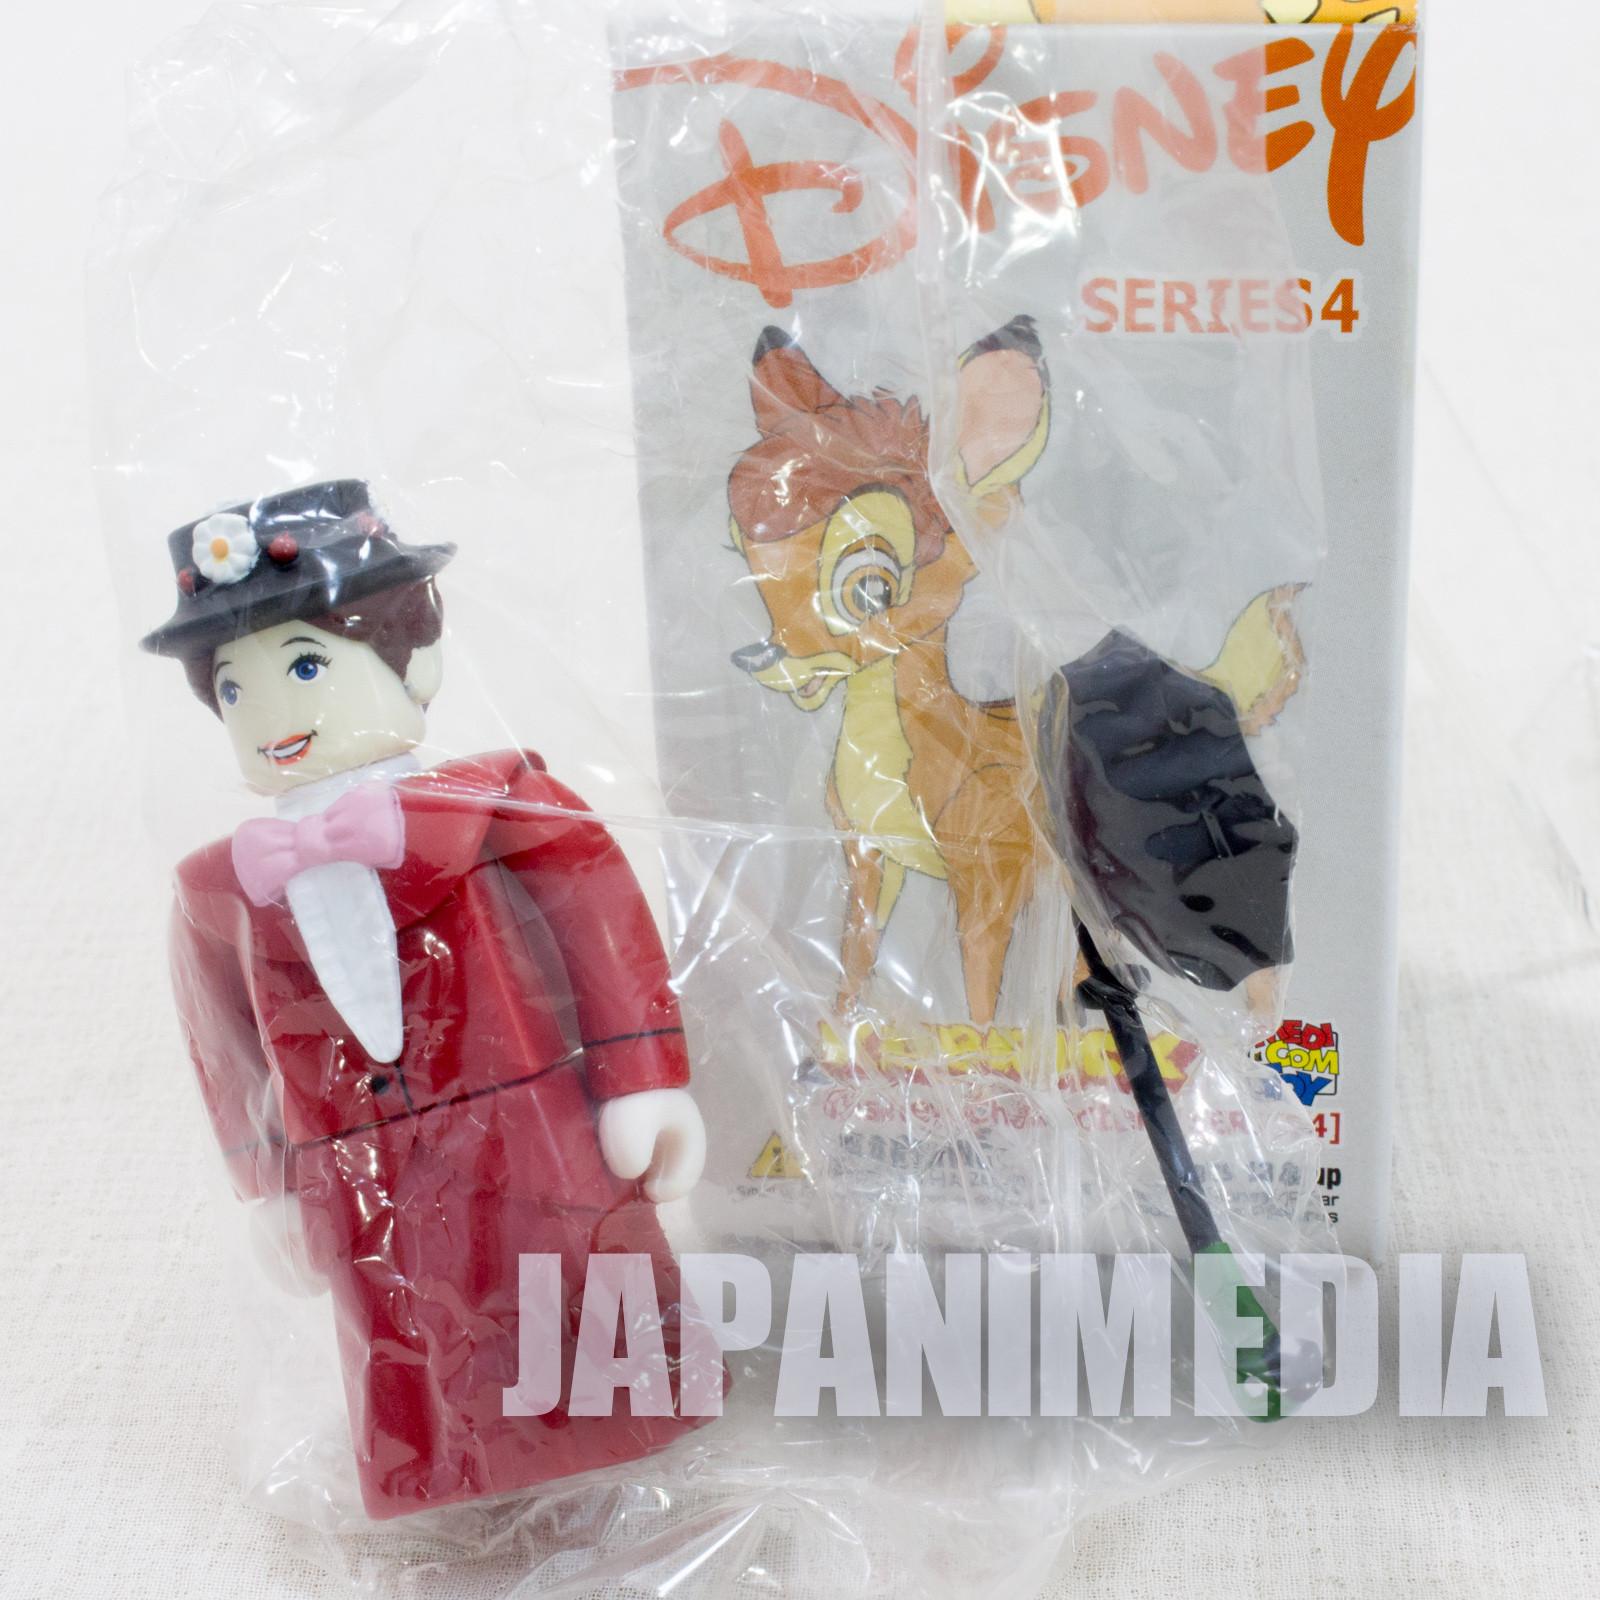 Disney Series 4 Mary Poppins Kubrick Figure Medicom Toy JAPAN